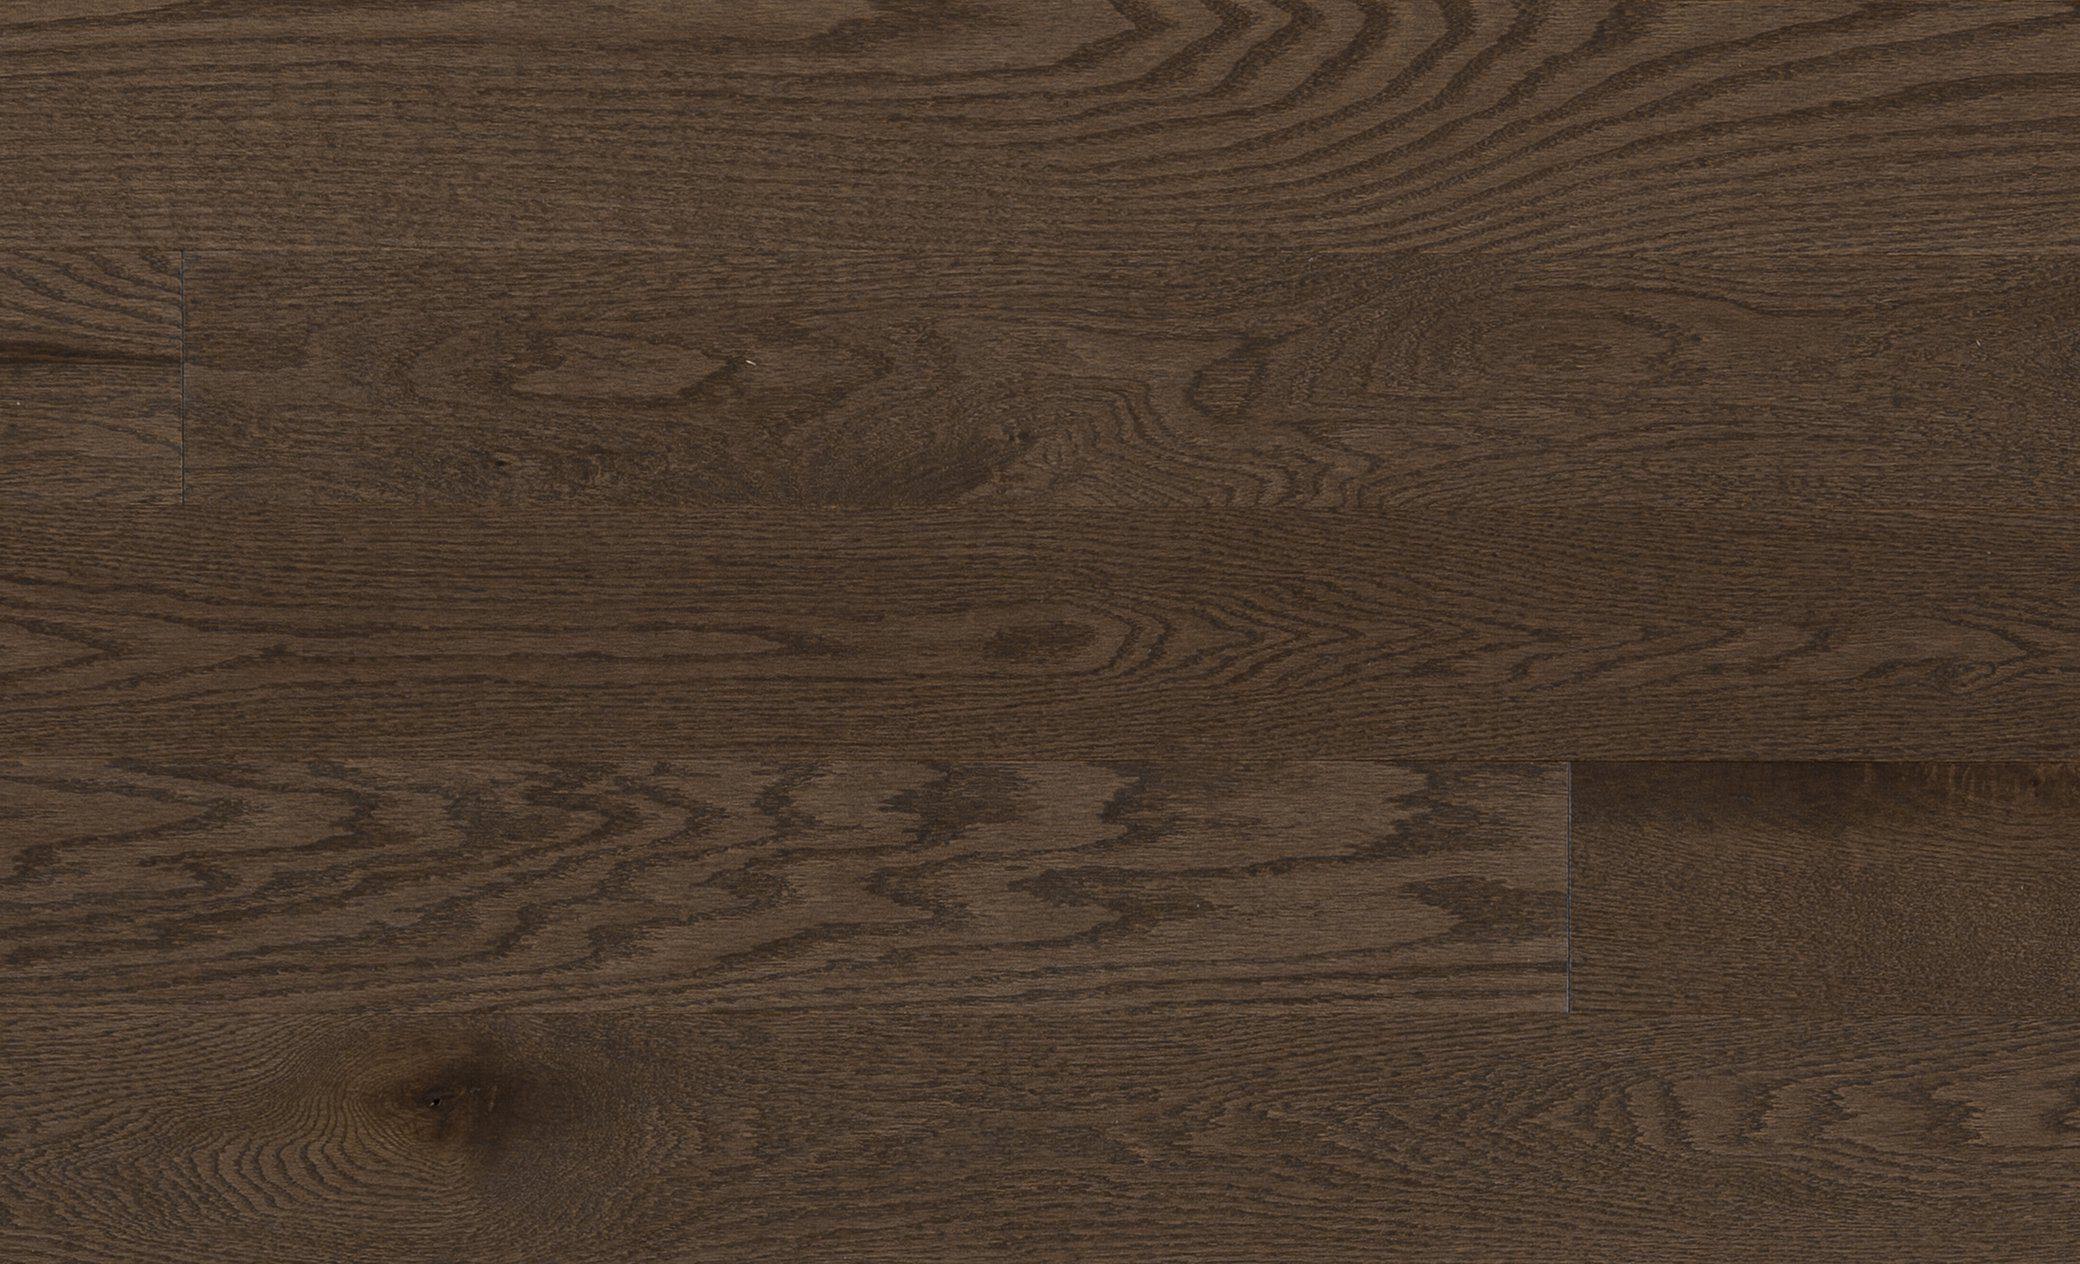 Mercier Red Oak Smoky Brown Solid Width: 2 1/4